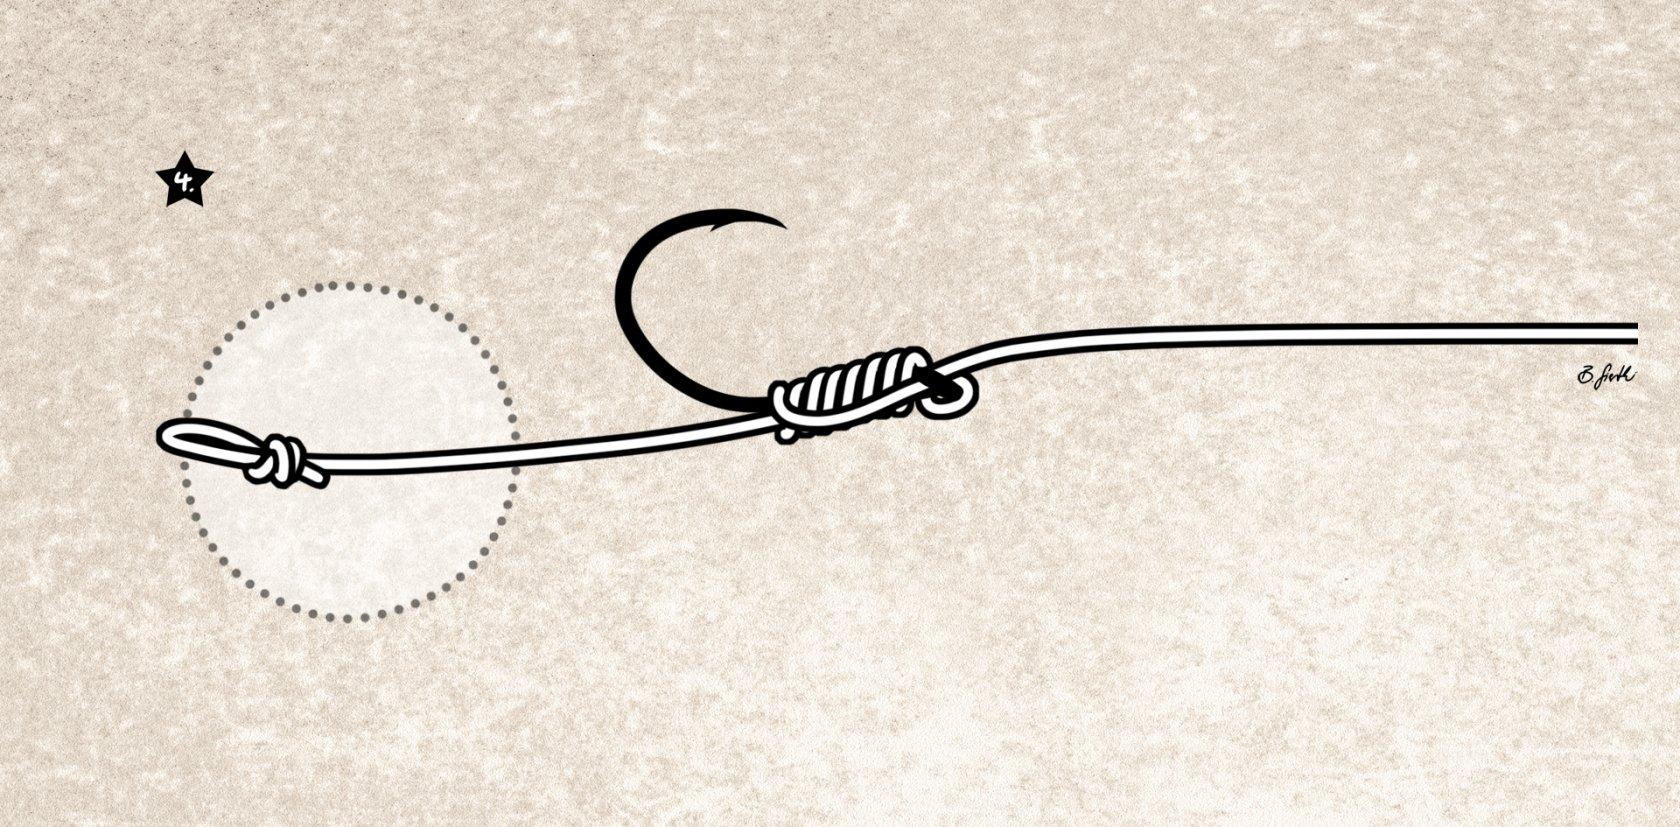 Knotenlos Haken binden